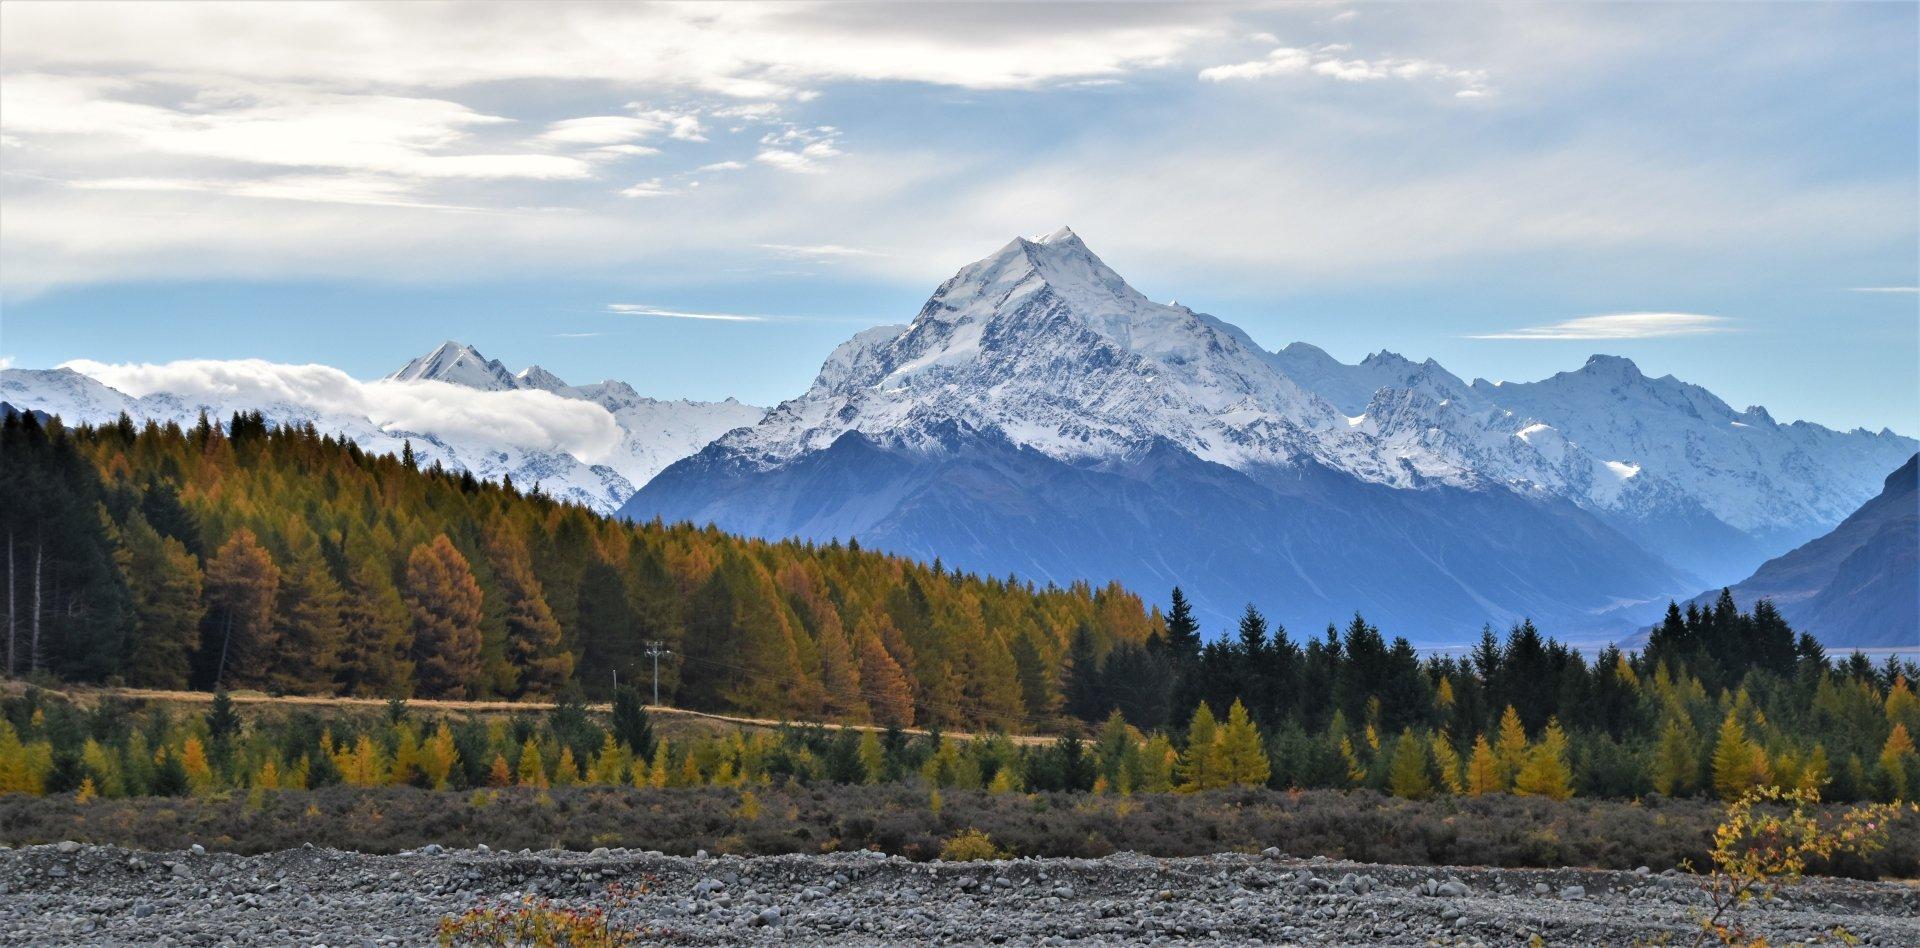 Earth - Aoraki/Mount Cook  Mountain South Island (New Zealand) Southern Alps Landscape Fall Wallpaper